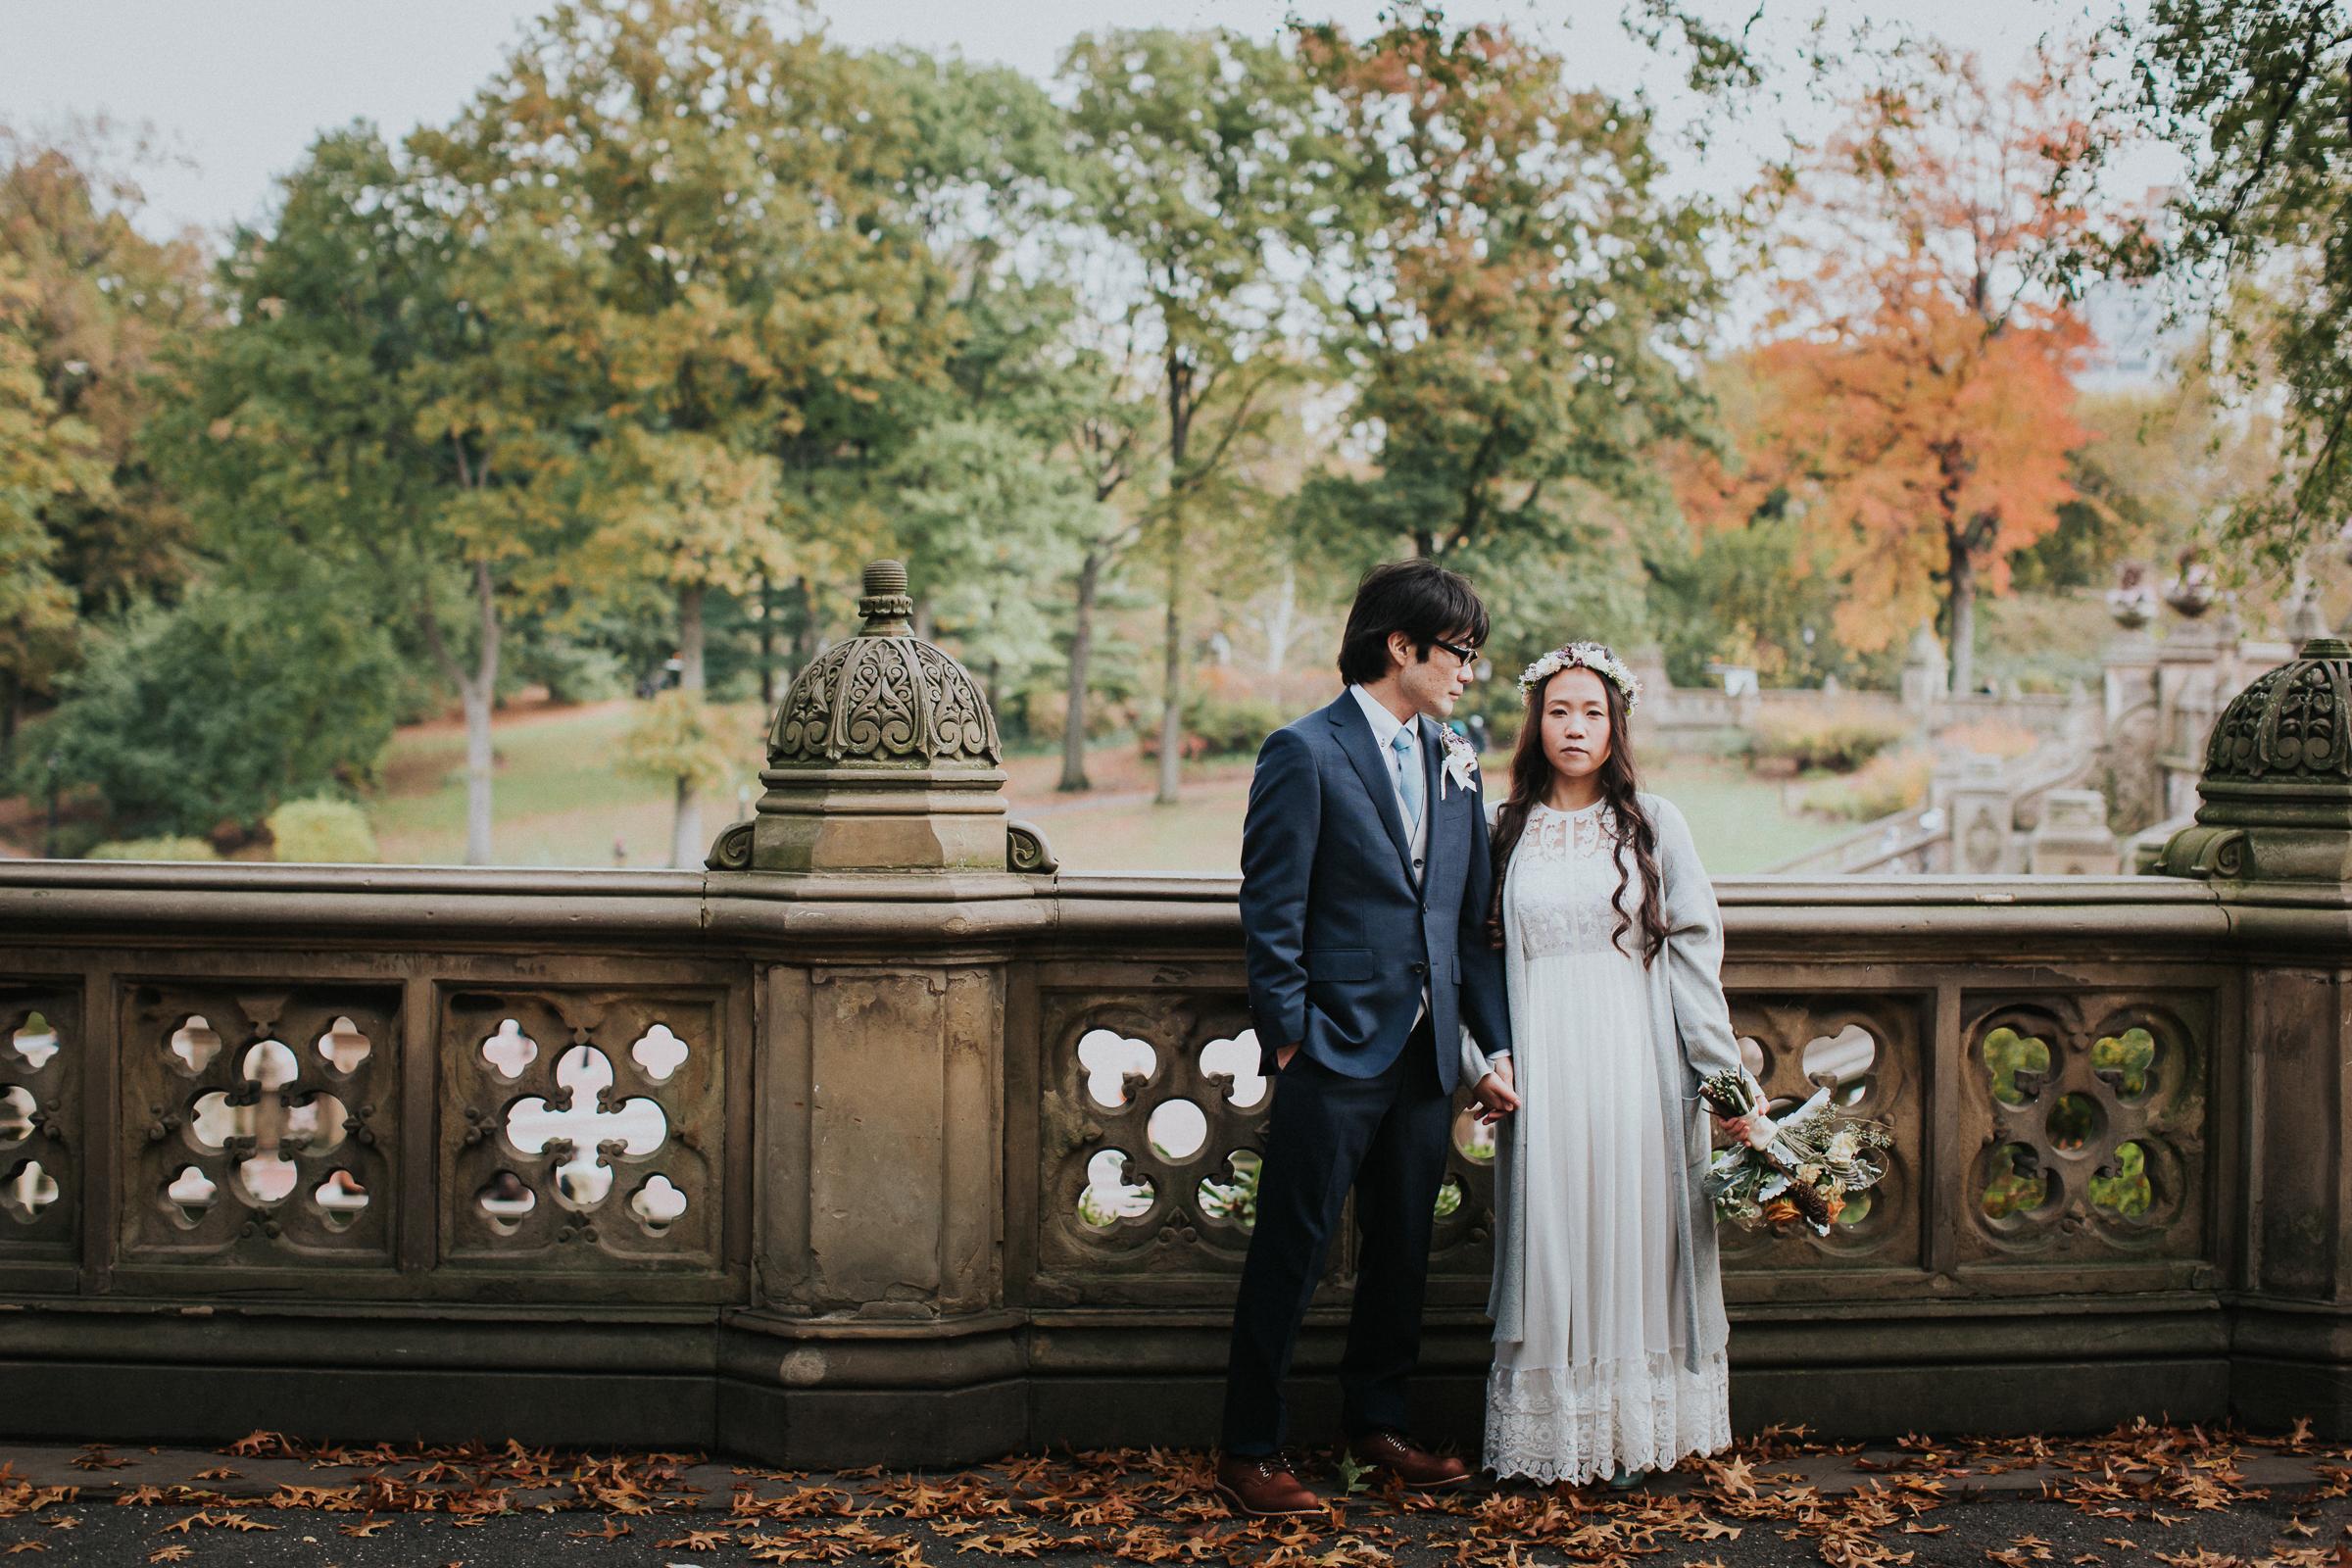 Central-Park-Brooklyn-Bridge-Dumbo-NYC-Documentary-Wedding-Photographer-47.jpg